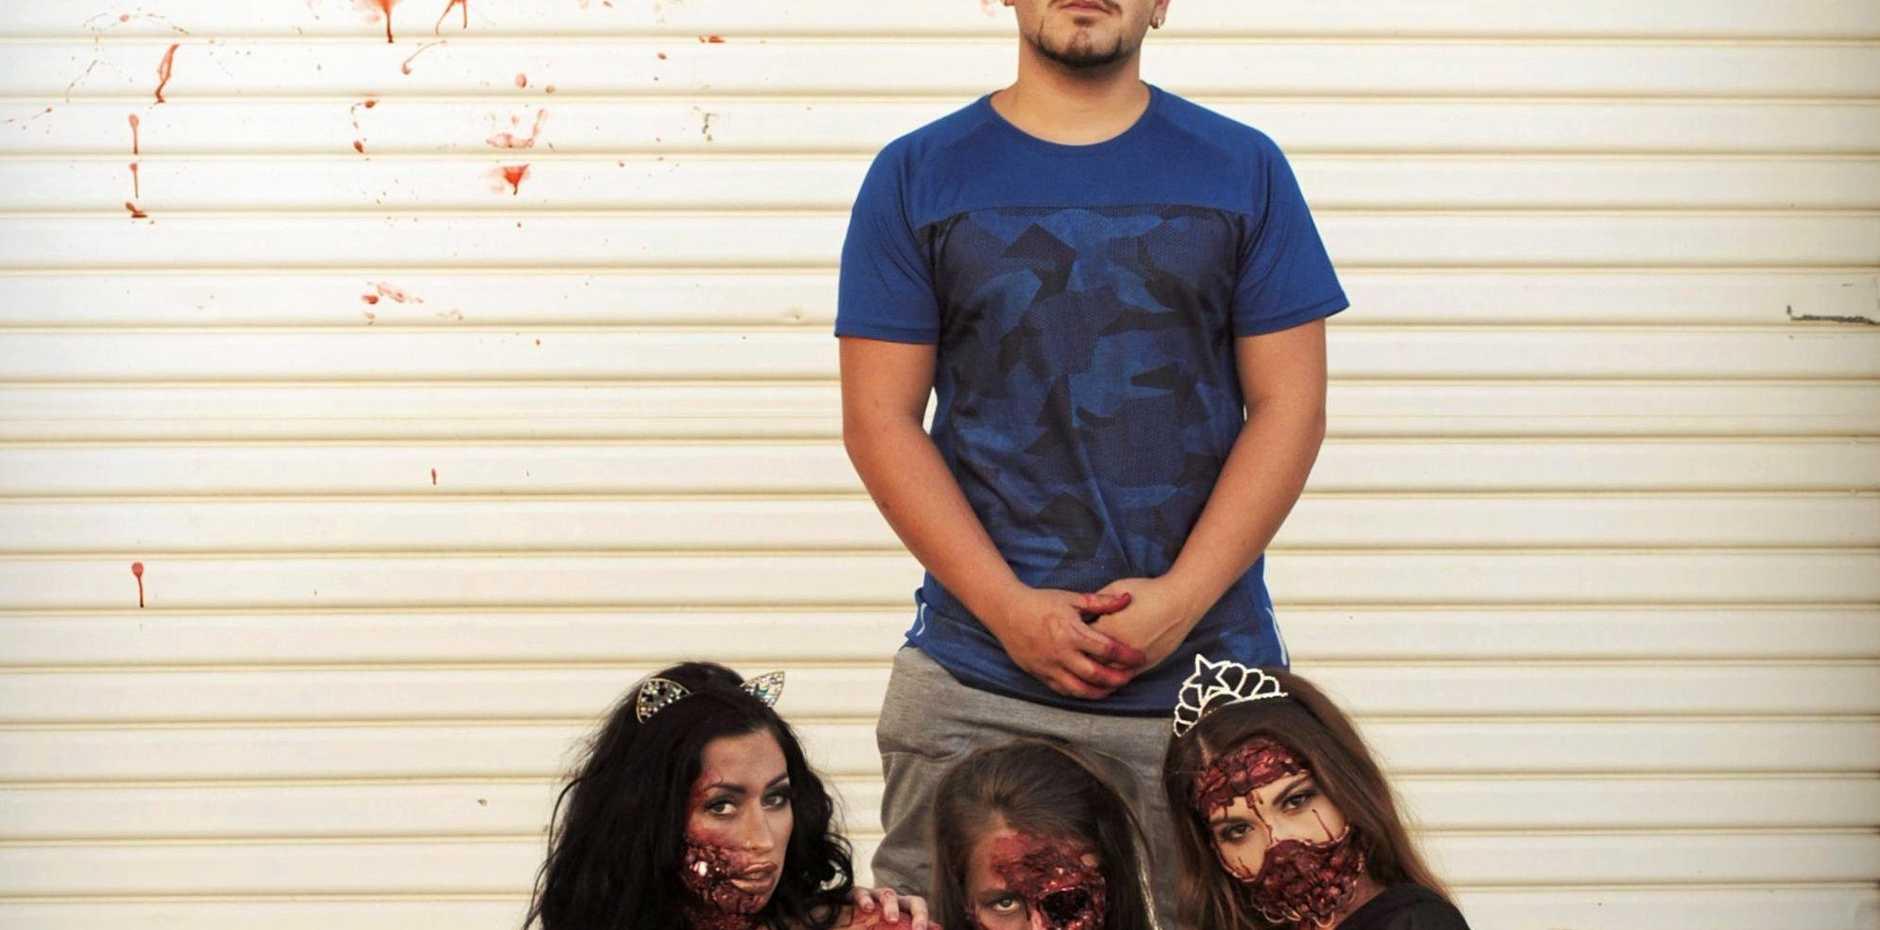 FACE OFF: Jake Ziano with models (L-R) Aleisha Balfoort, Lydia Lara and Chynna Williams.